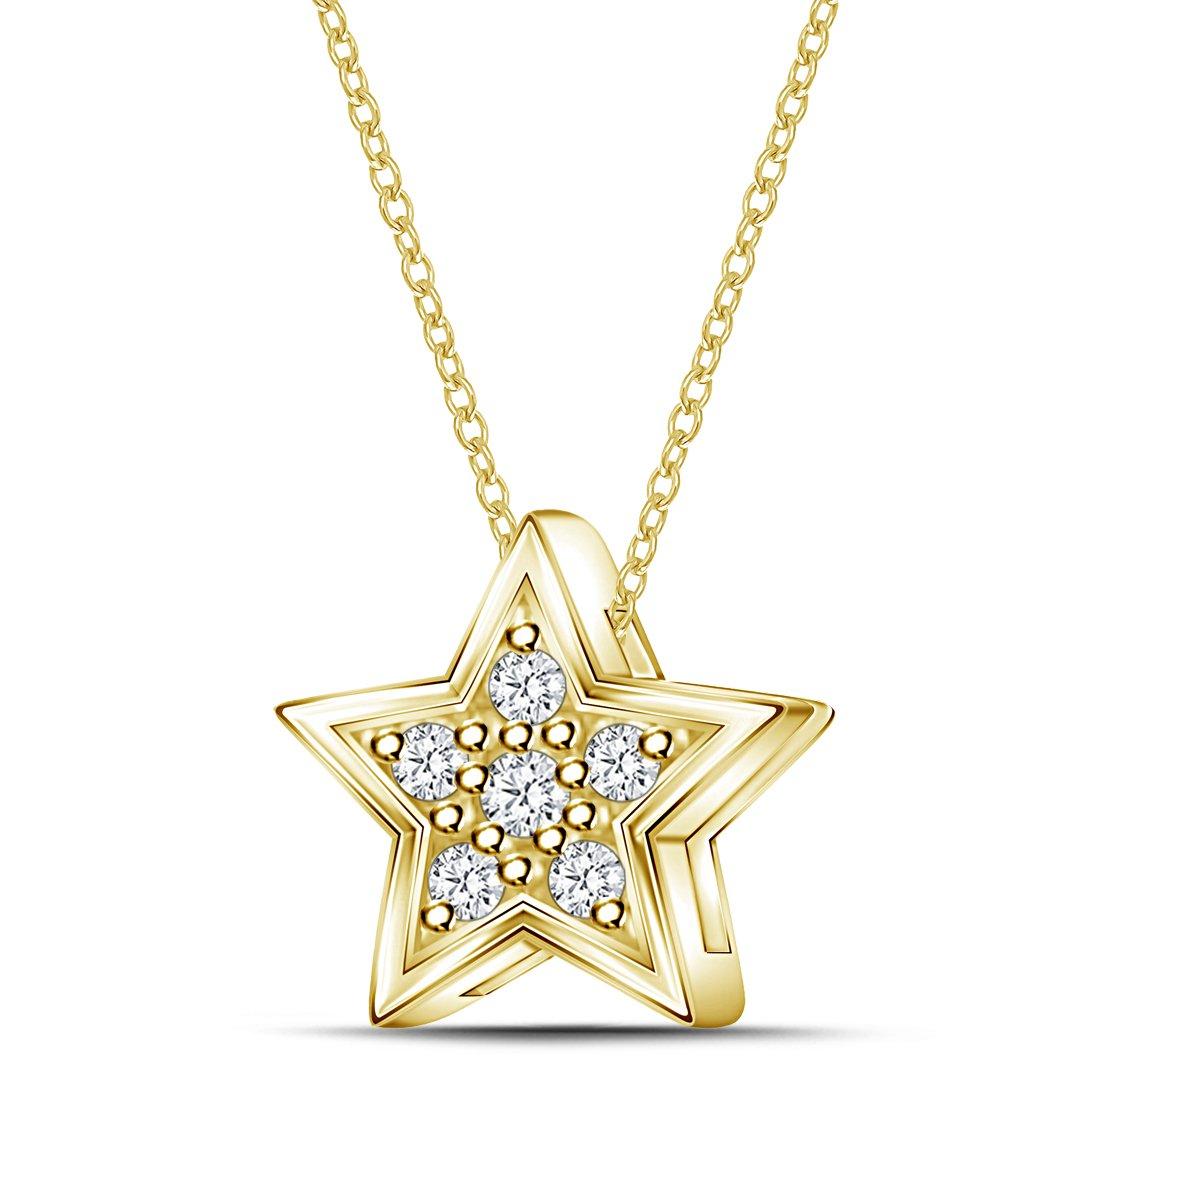 0.04cttw, IJ, I2-I3 18 925 Silver Mini Star Shape Diamond Pendant Necklace